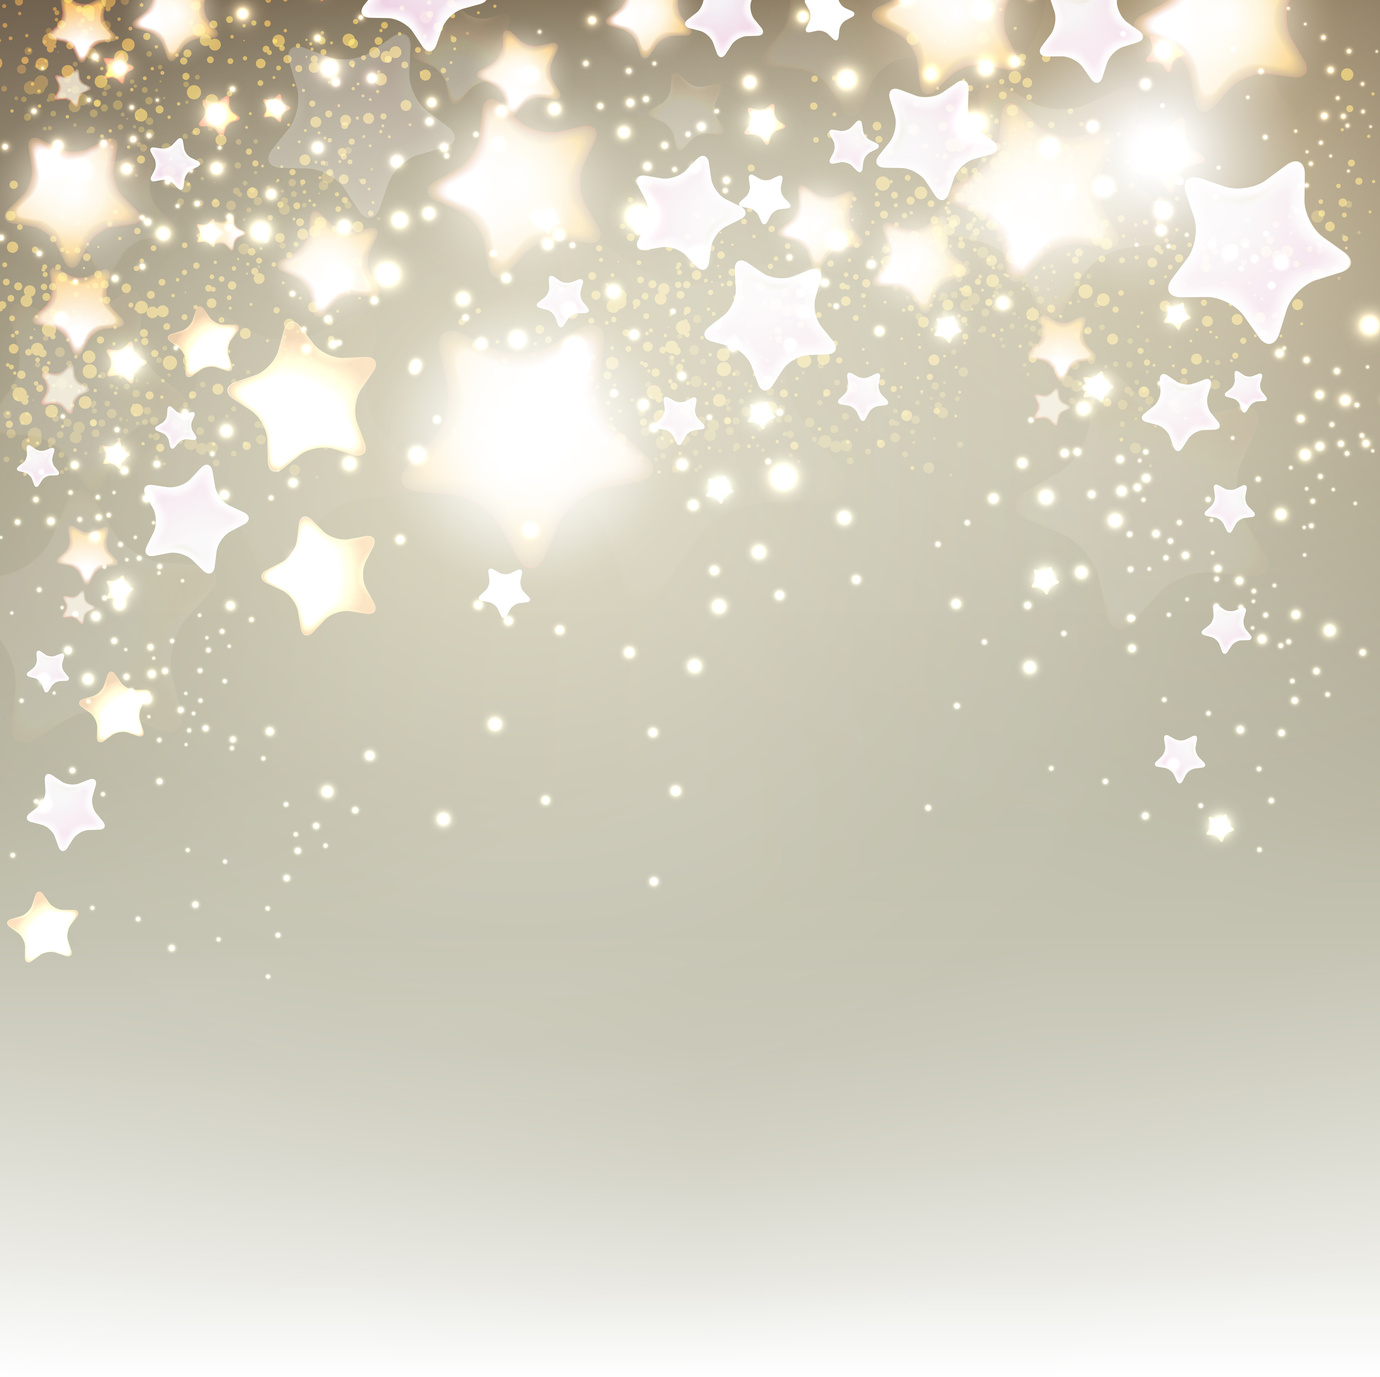 New Years Eve Invitation with luxury invitations design